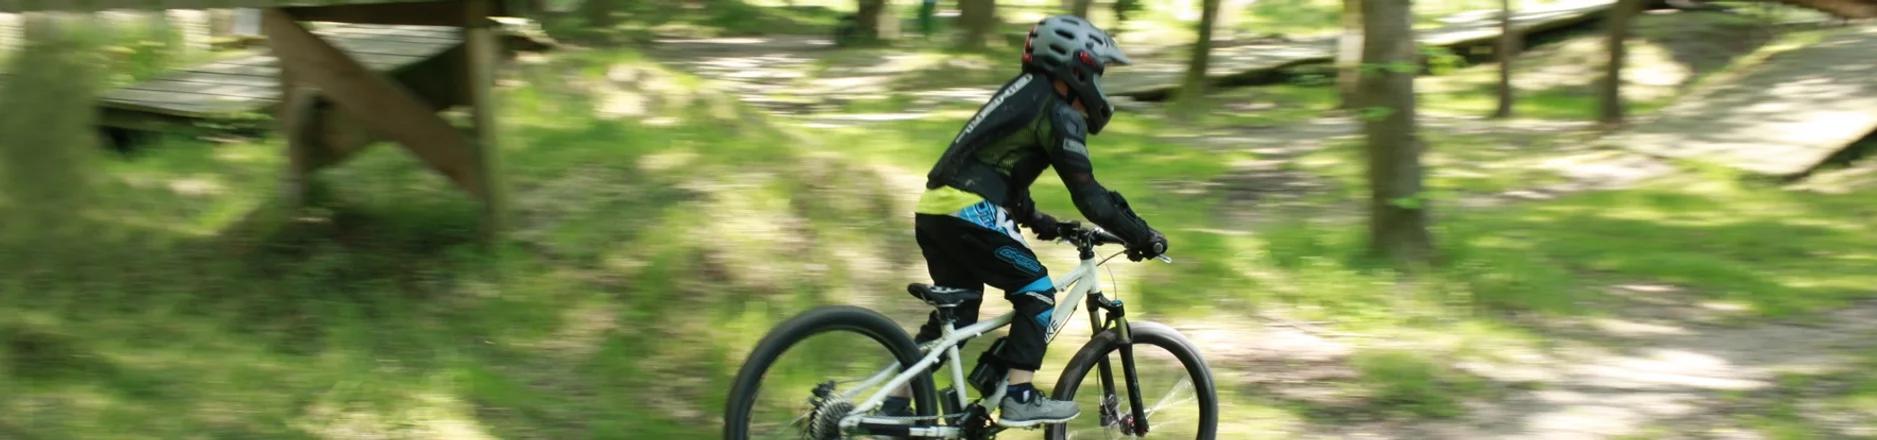 Ben E-Bike